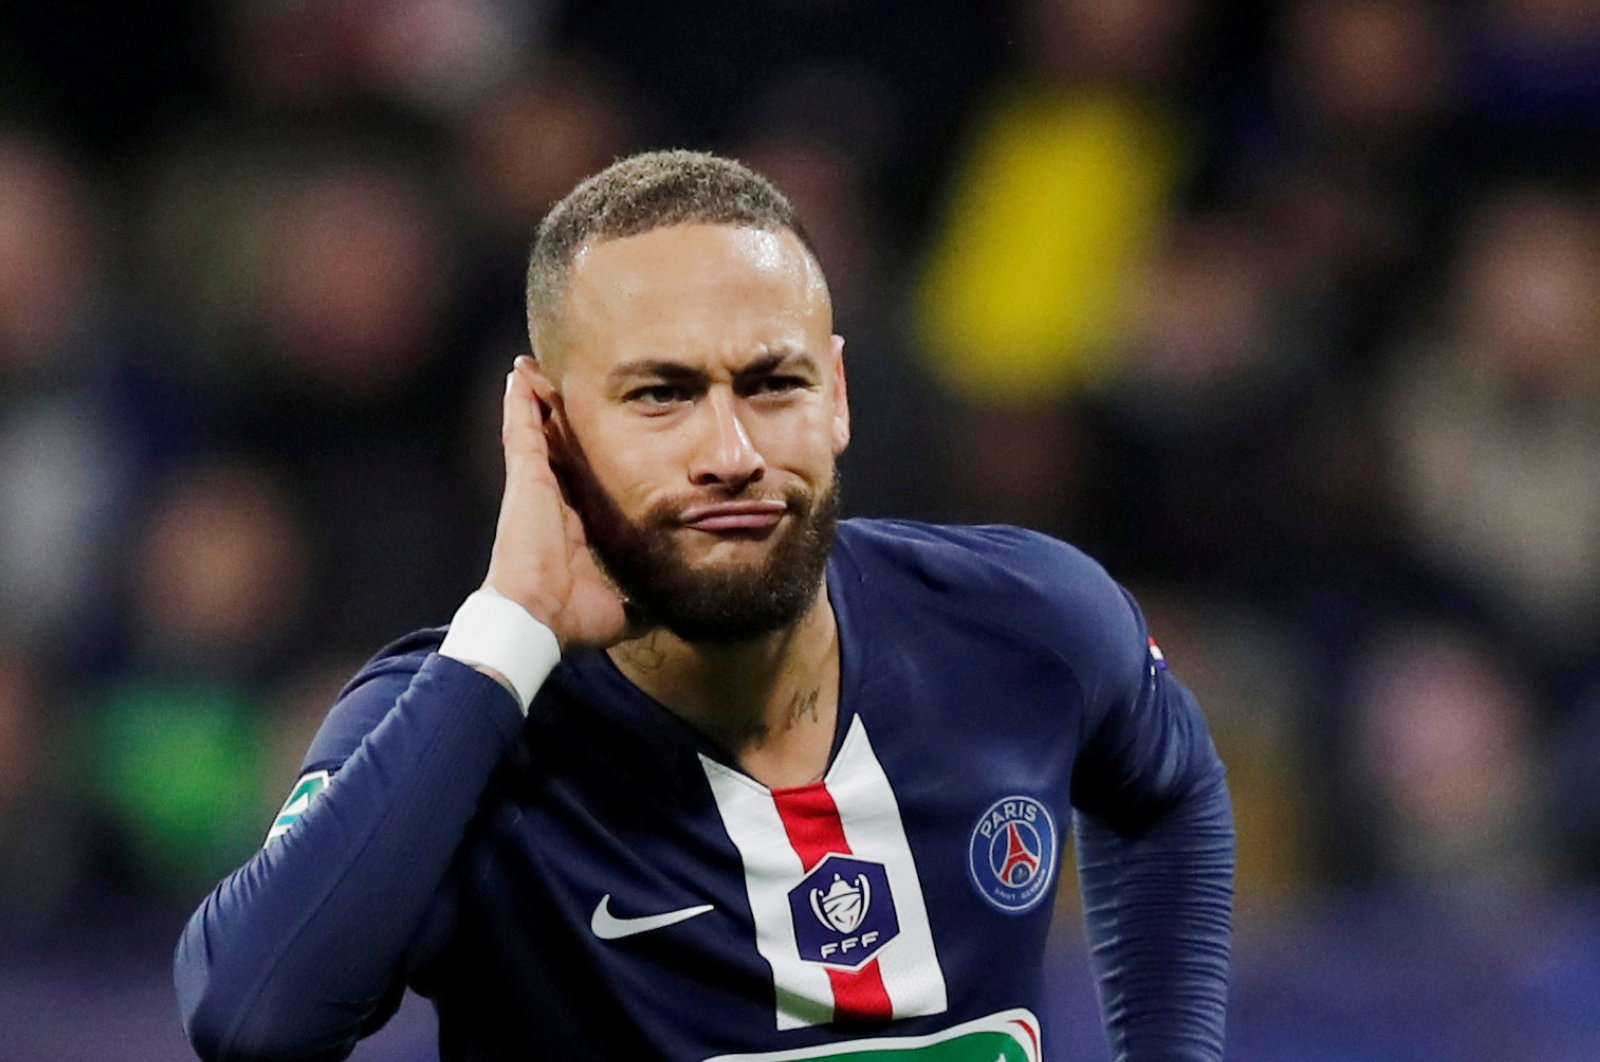 Paris Saint Germain's Neymar celebrates scoring a goal during Coupe de France semifinal football match between Olympique Lyonnais and Paris Saint Germain at the Groupama Stadium in Lyon, France, March 4, 2020. (Reuters Photo)